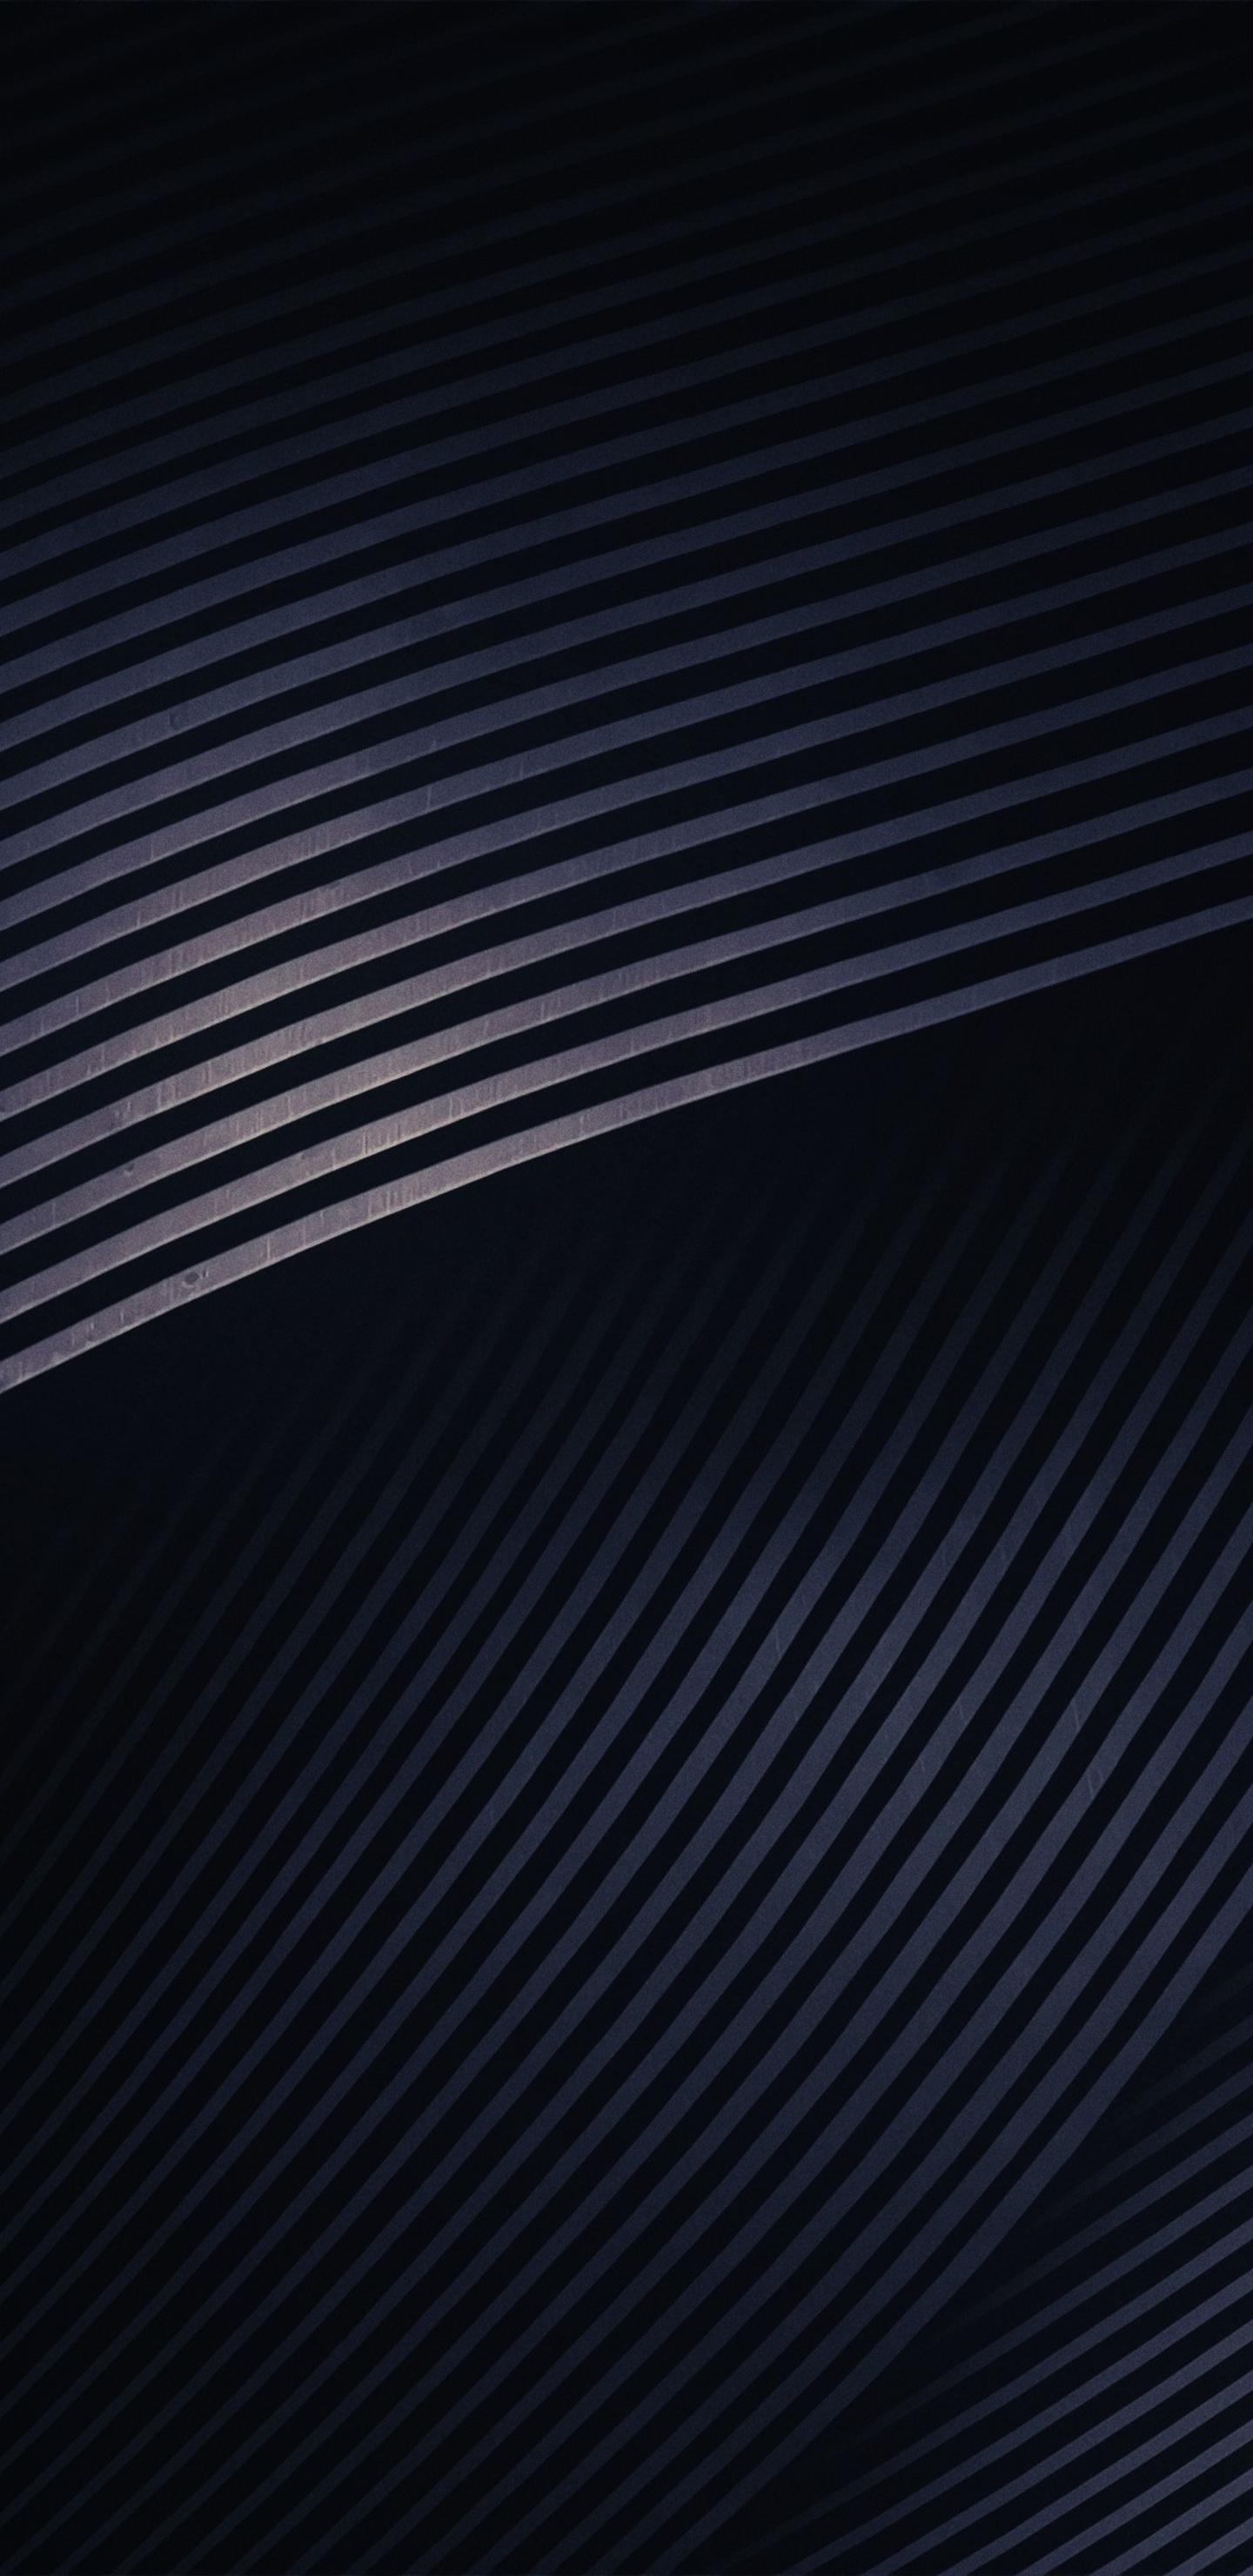 1440x2960 Abstract Dark Shapes Light 4k Samsung Galaxy S8 ...